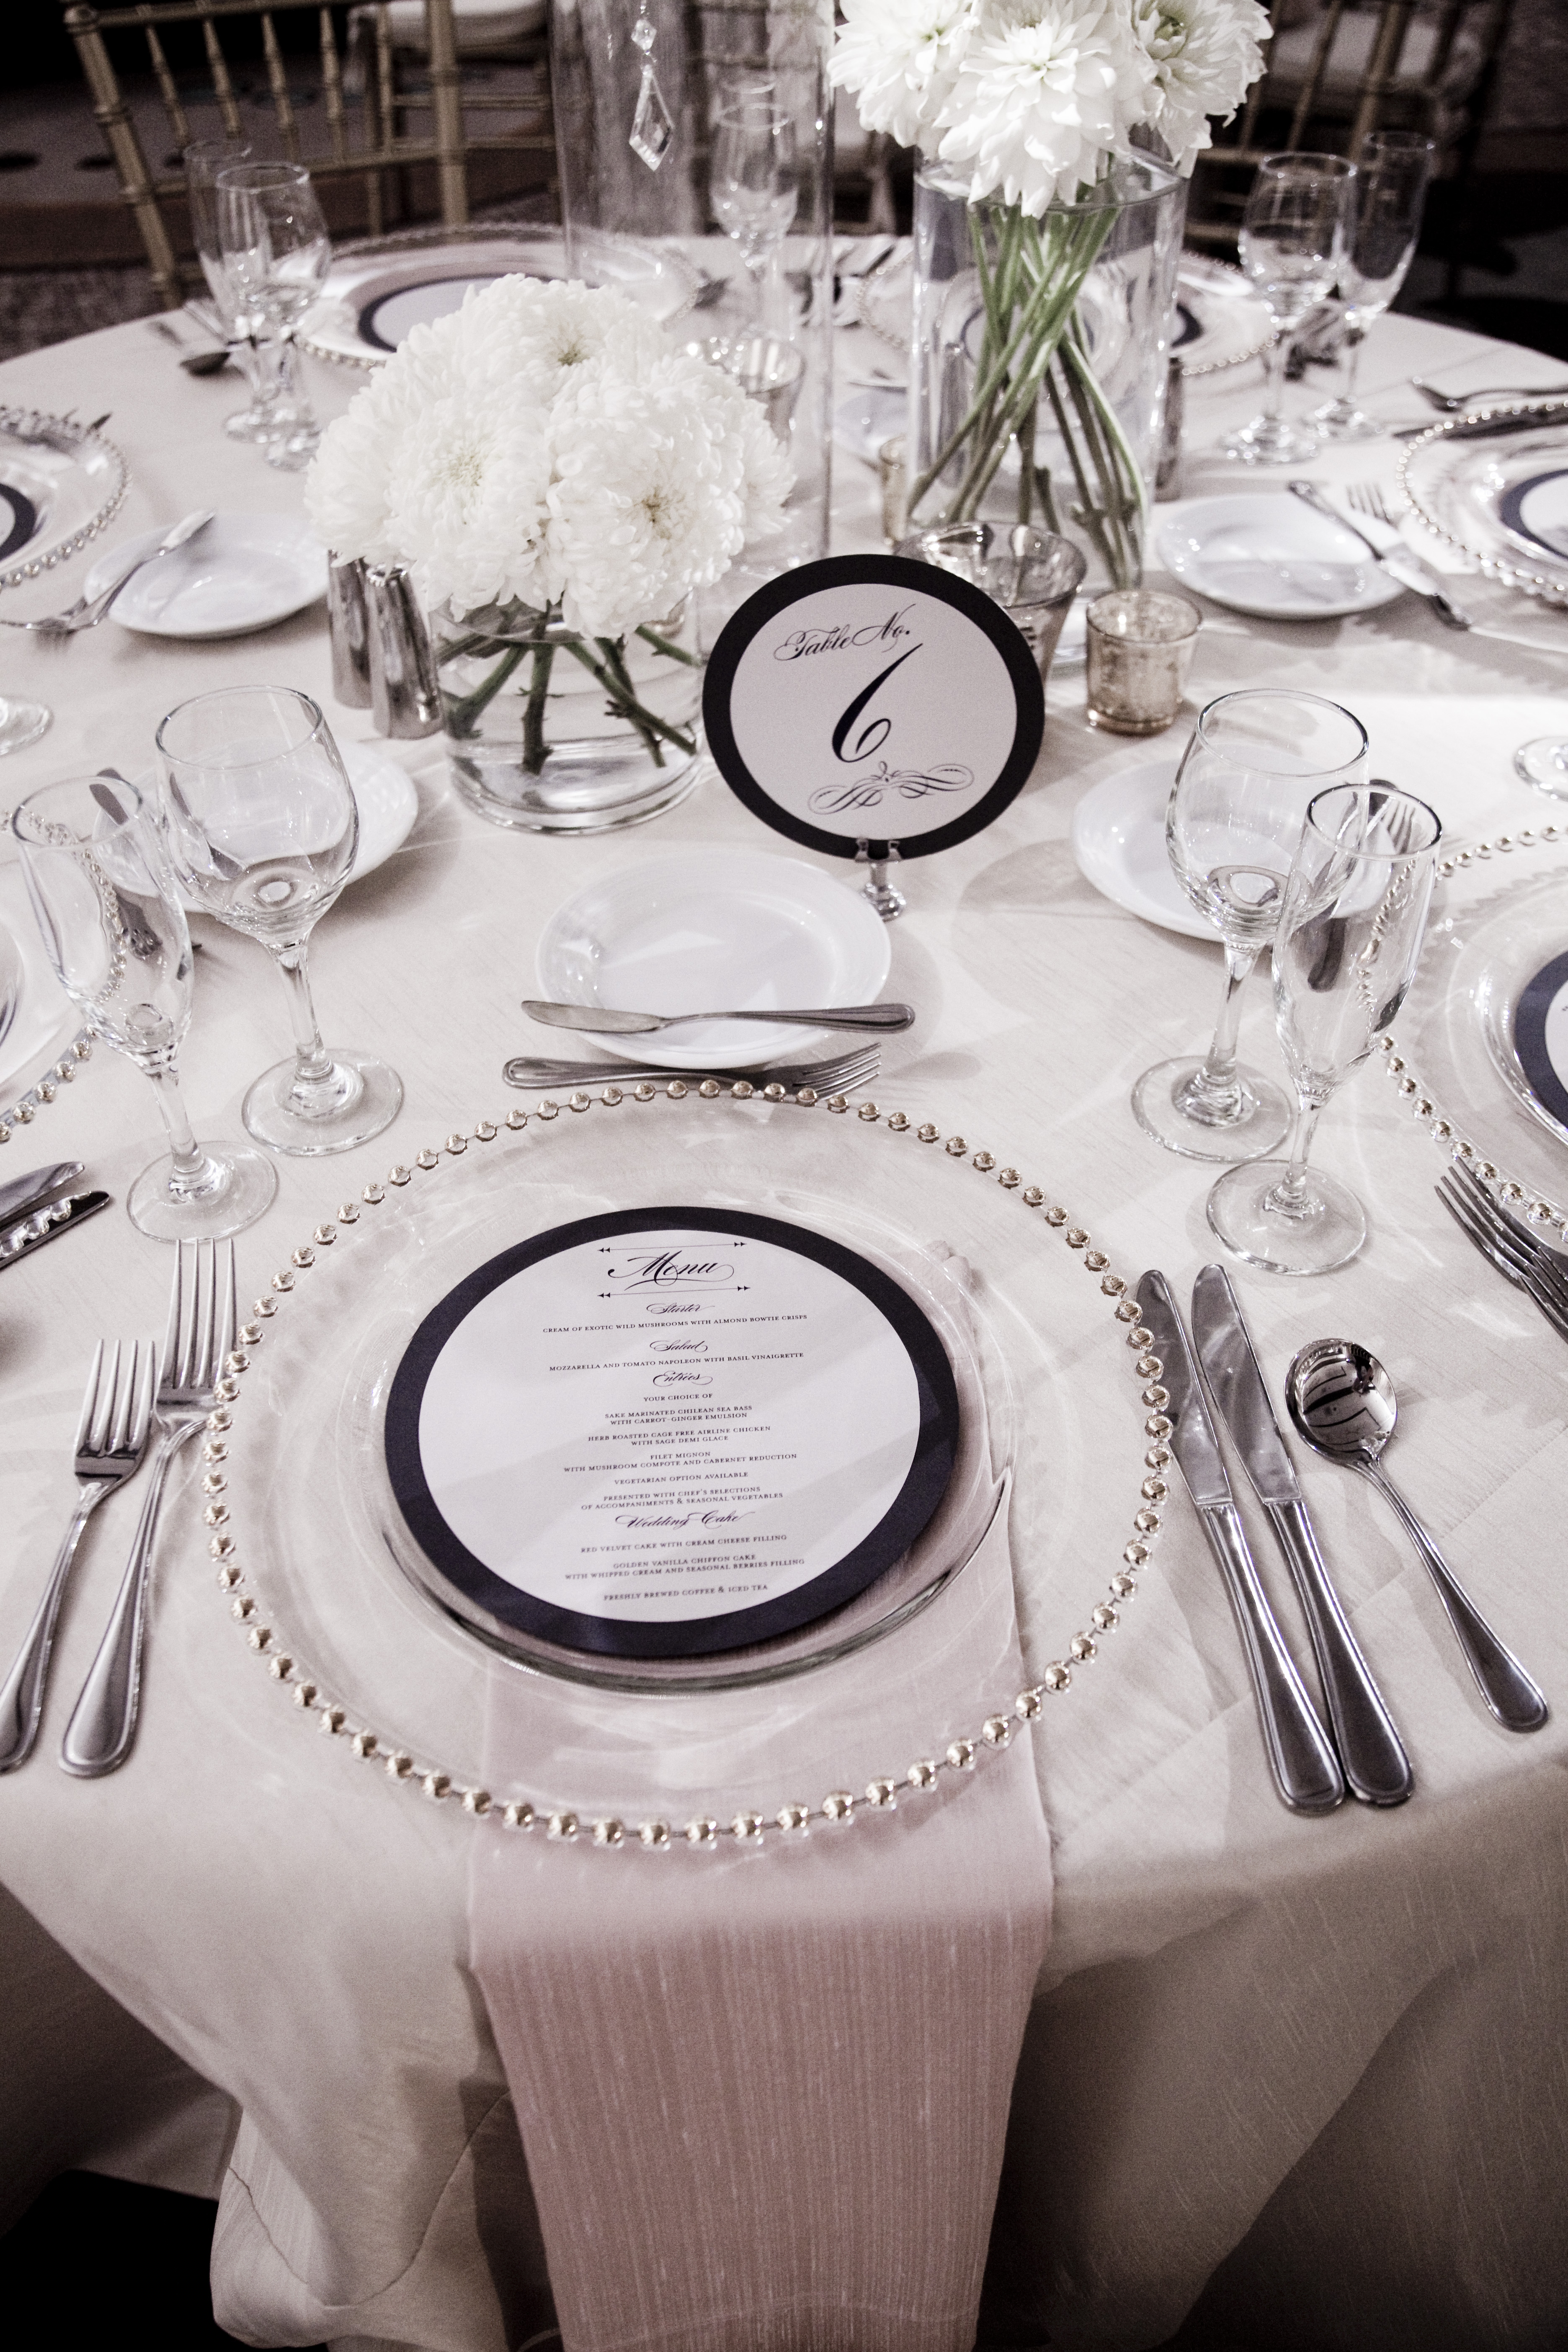 Hyatt Regency Newport Beach, Blush and White Wedding, A Good Affair Wedding & Event Production, Capturing Moments, My Floral Bliss